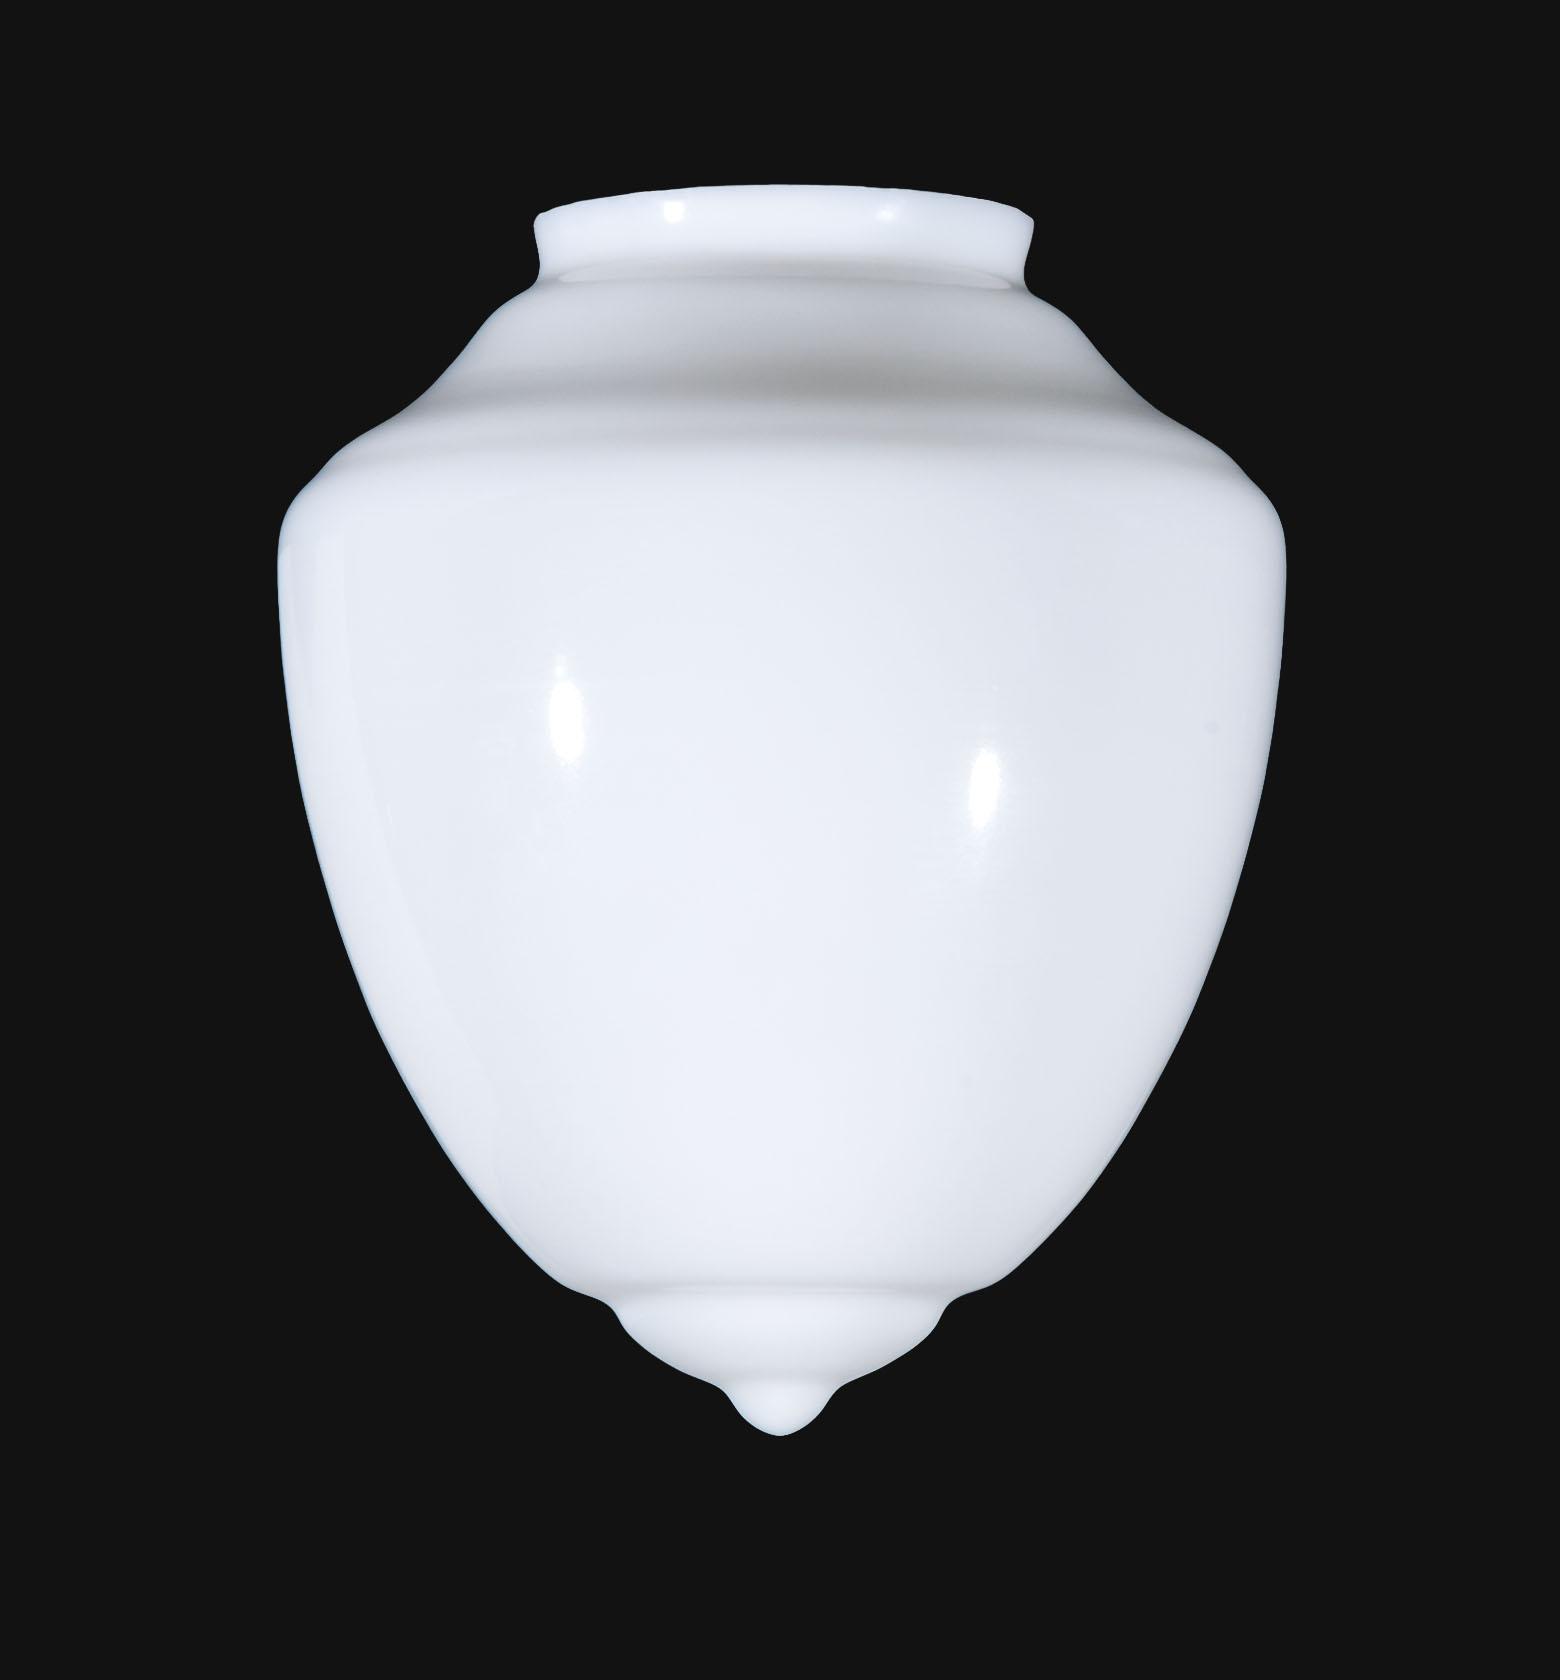 08809 8 Opal Pendant Shade Art Deco Style